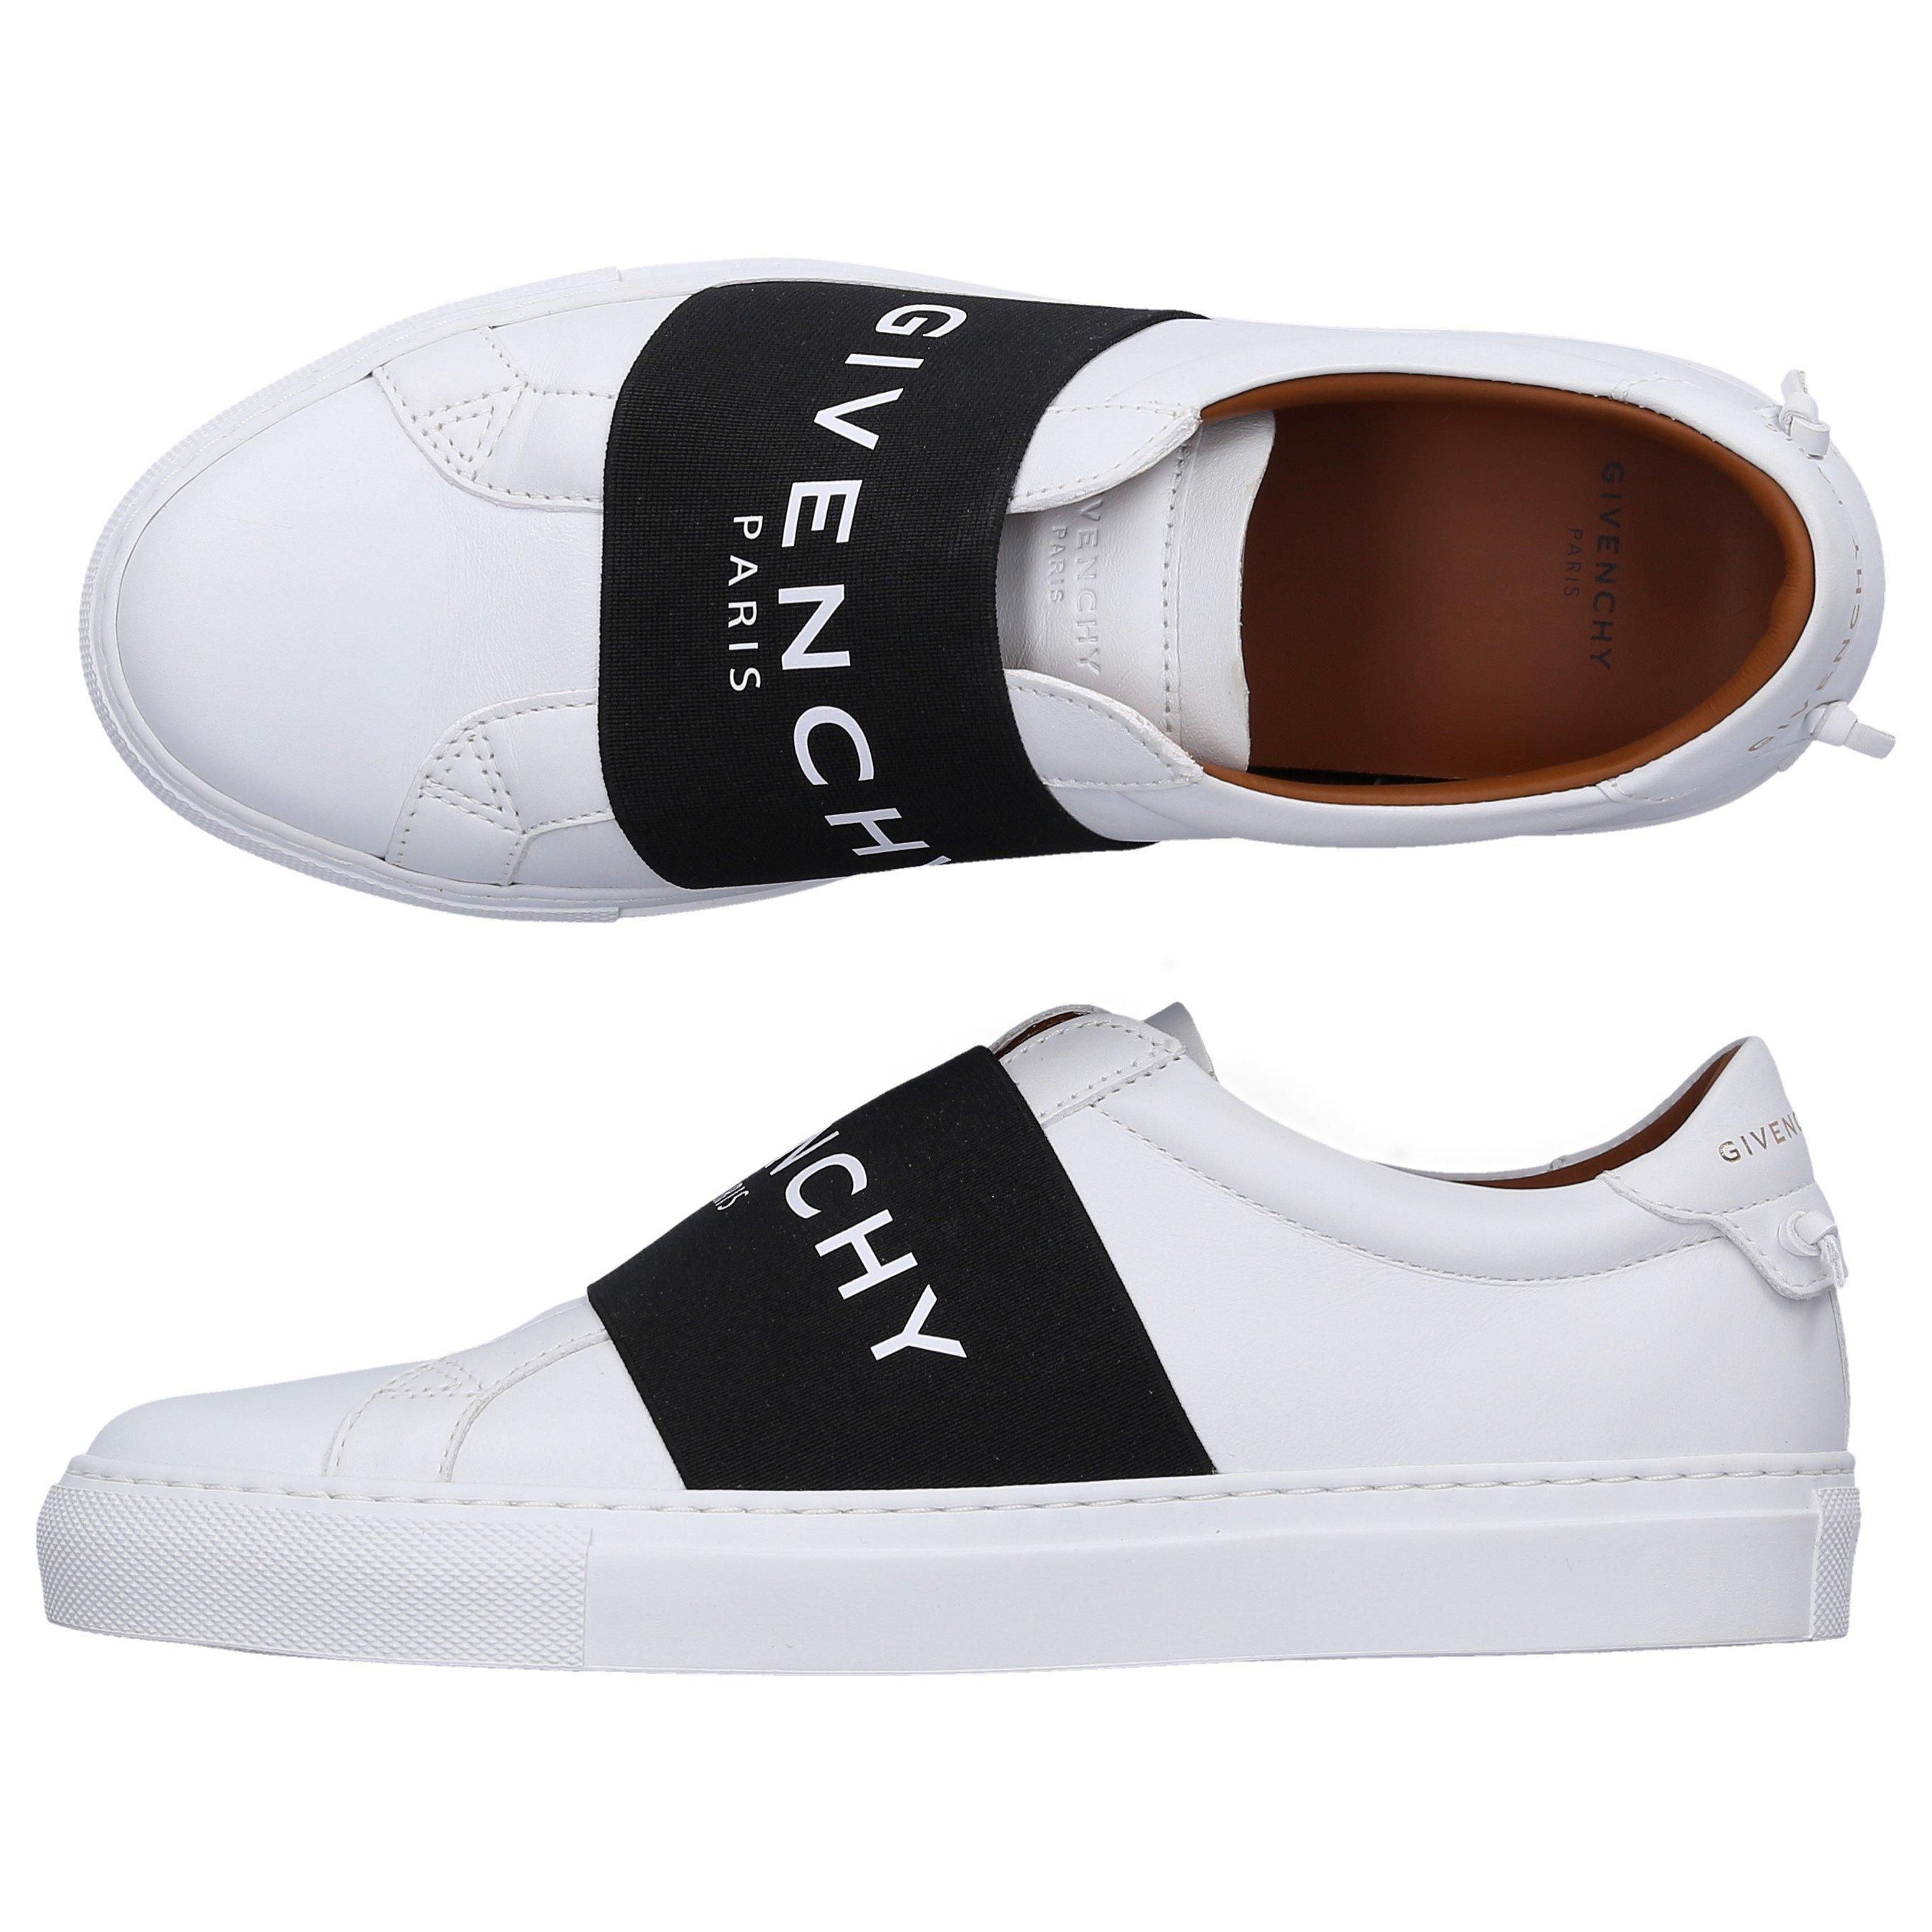 Givenchy Slip-On Urban Street In Black,White